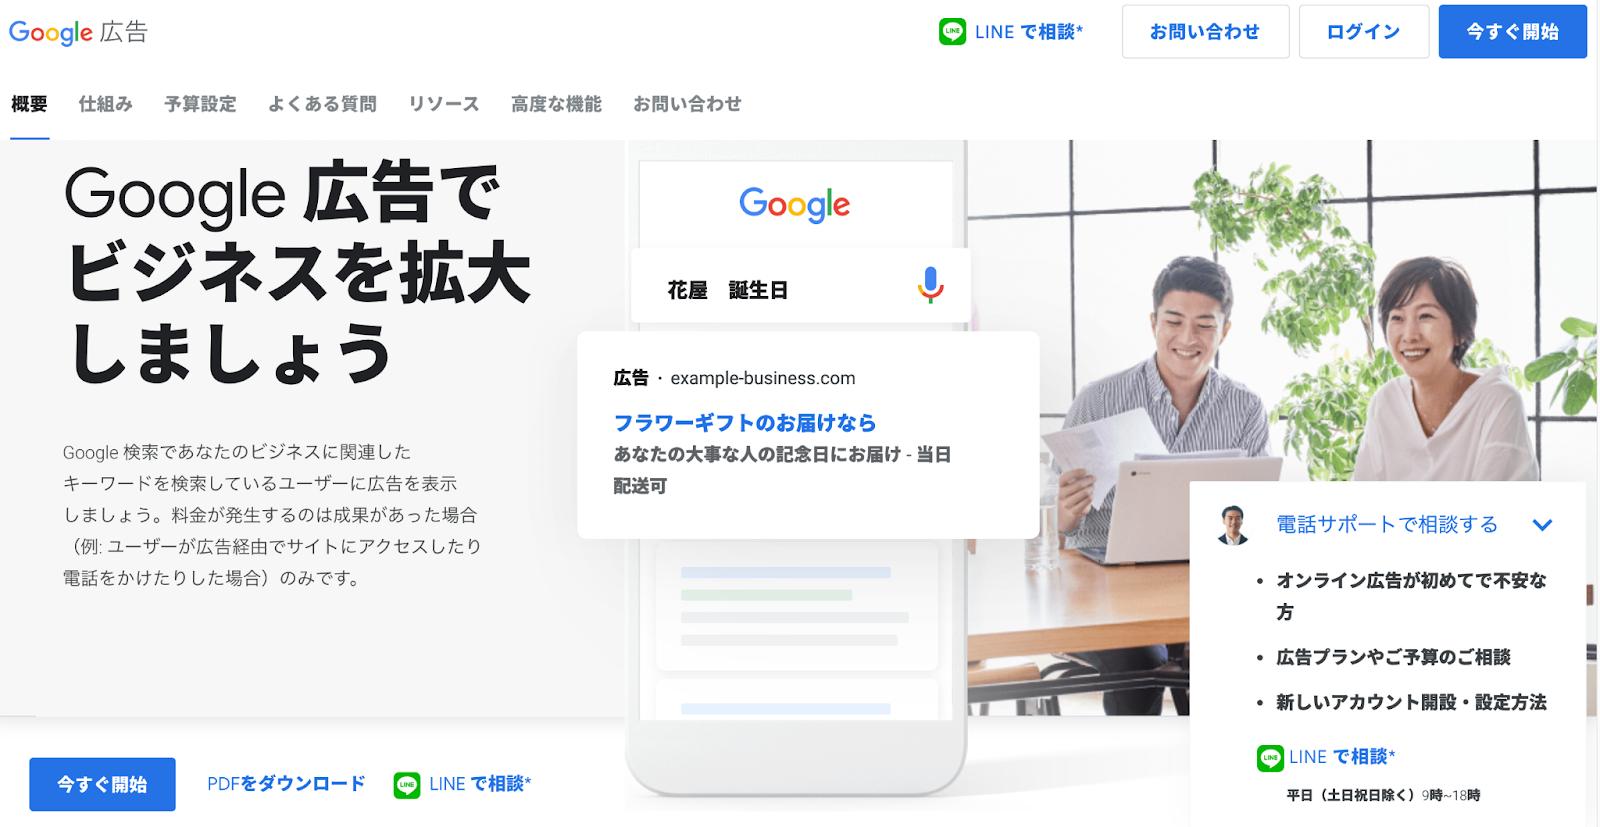 Google広告のトップ画面